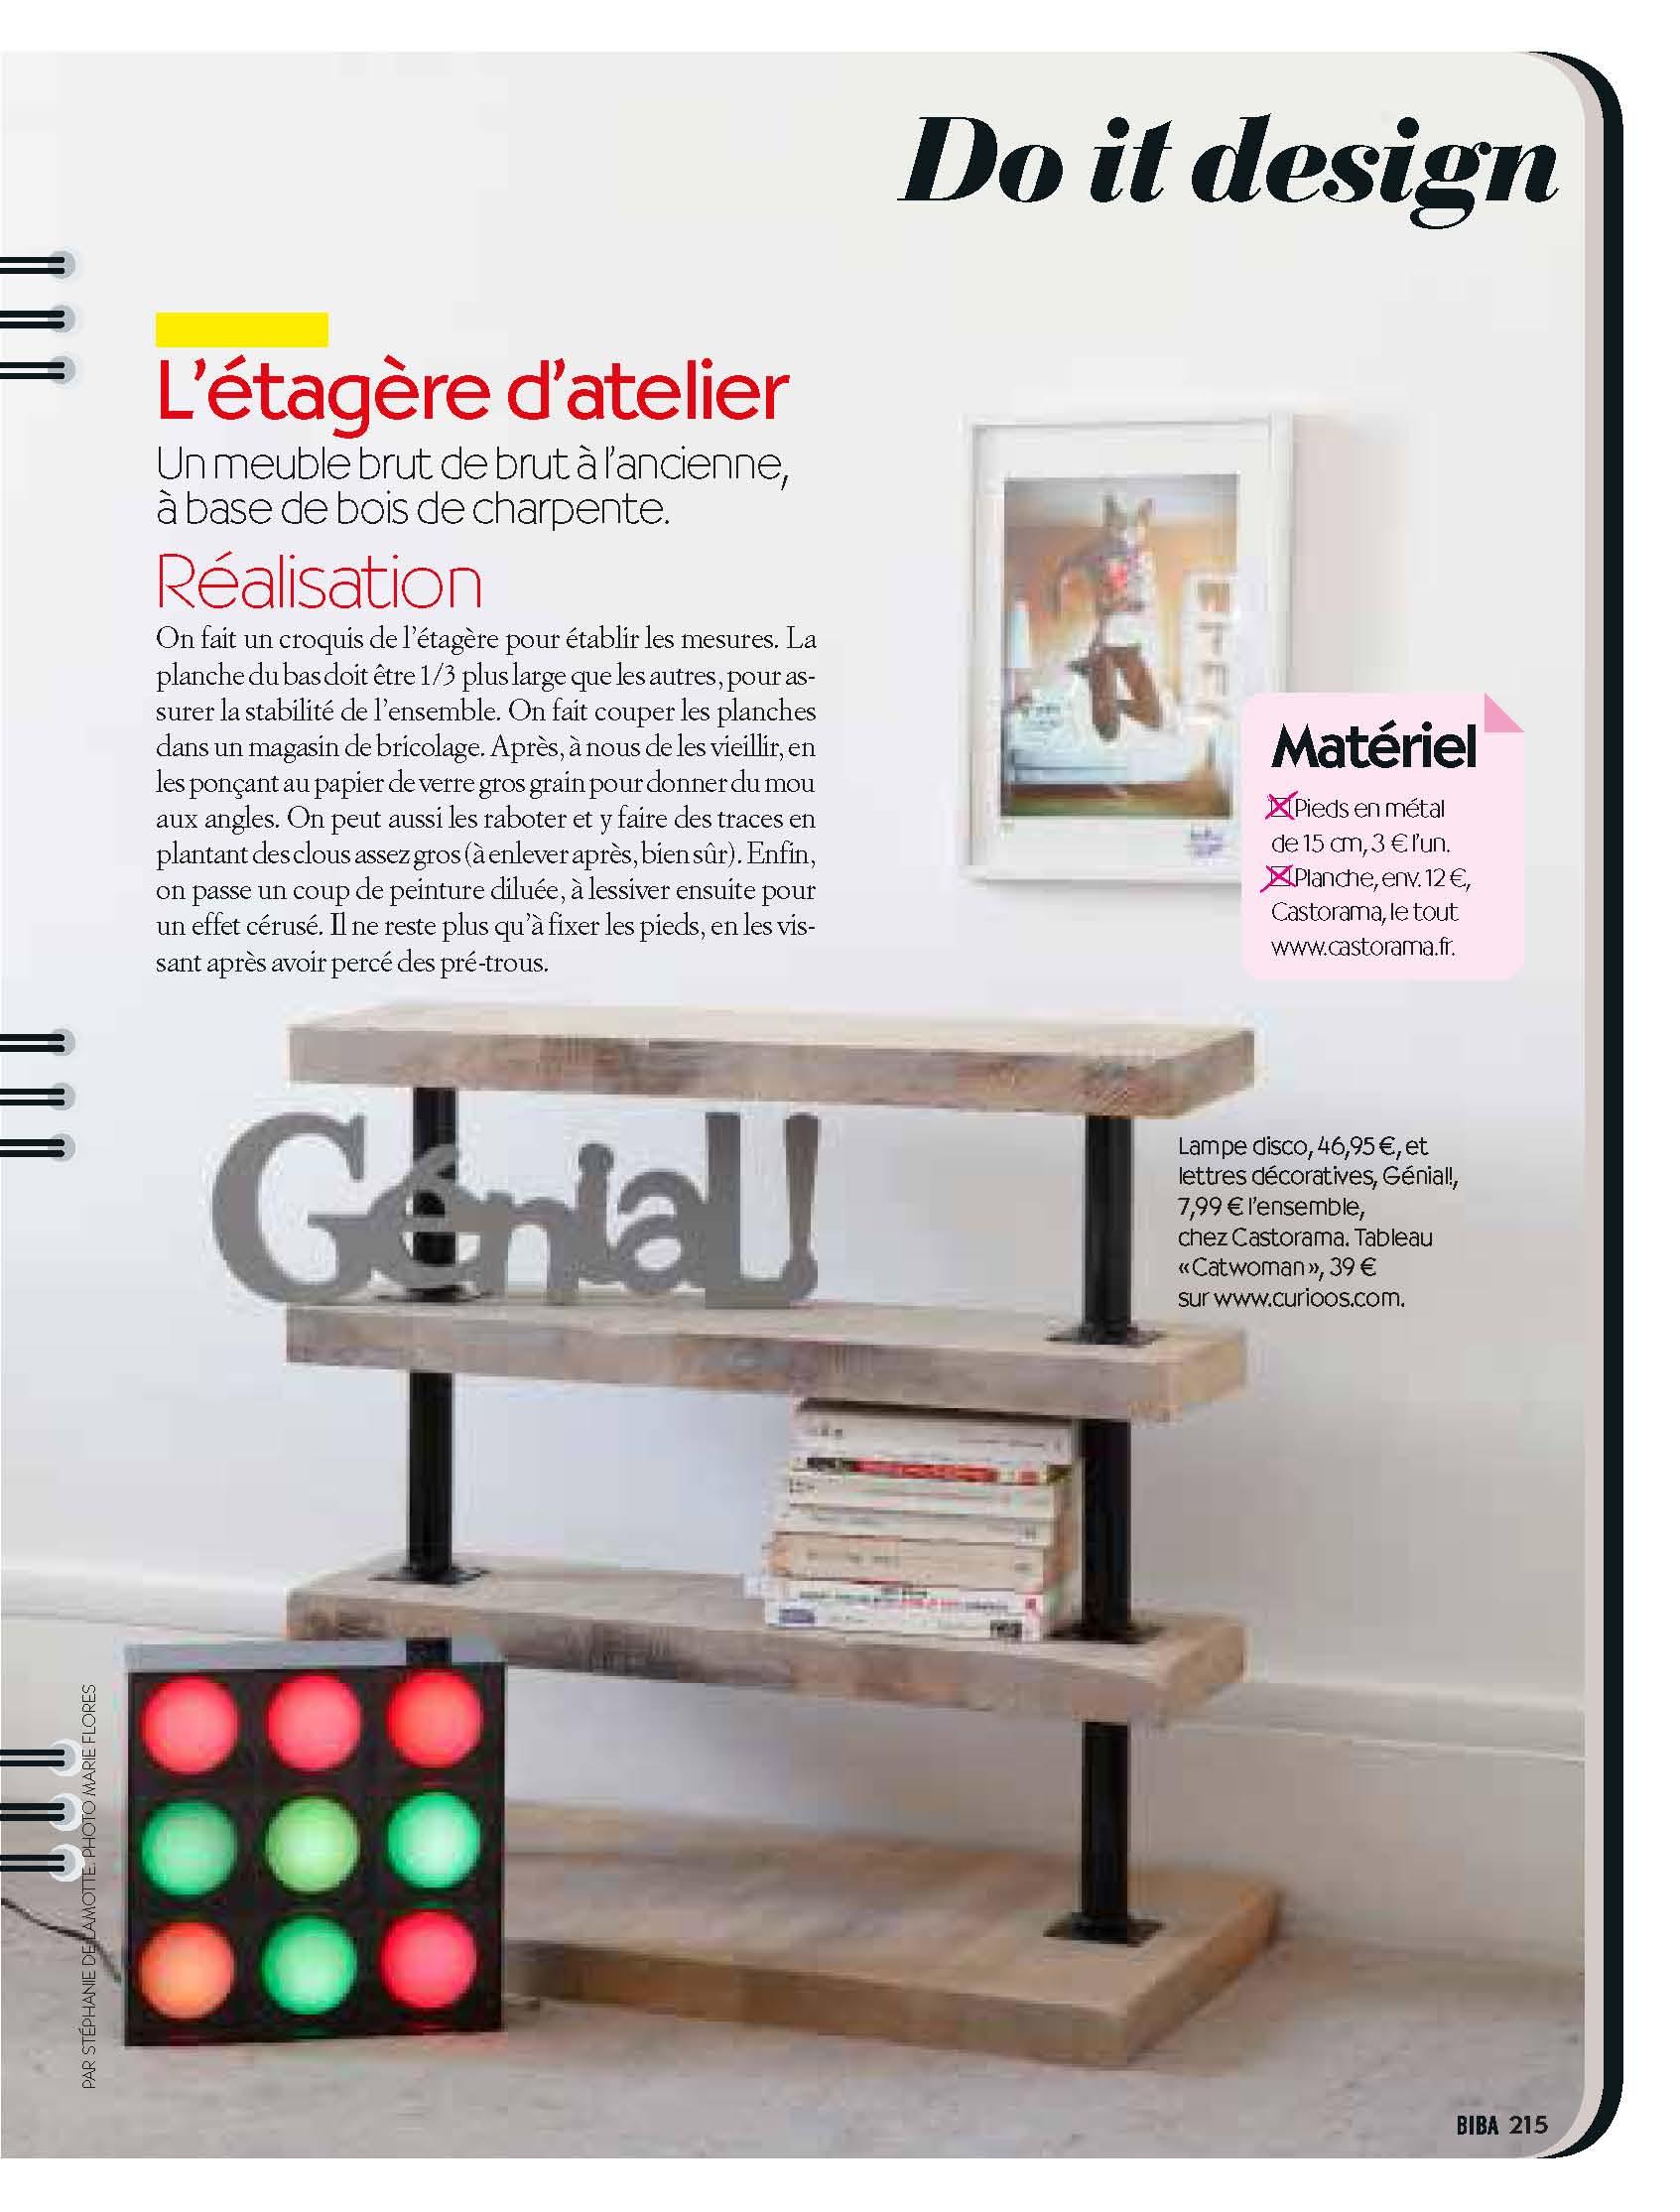 finest diy biba avril ralisation styliste journaliste stphanie de lamotte with table picnic. Black Bedroom Furniture Sets. Home Design Ideas